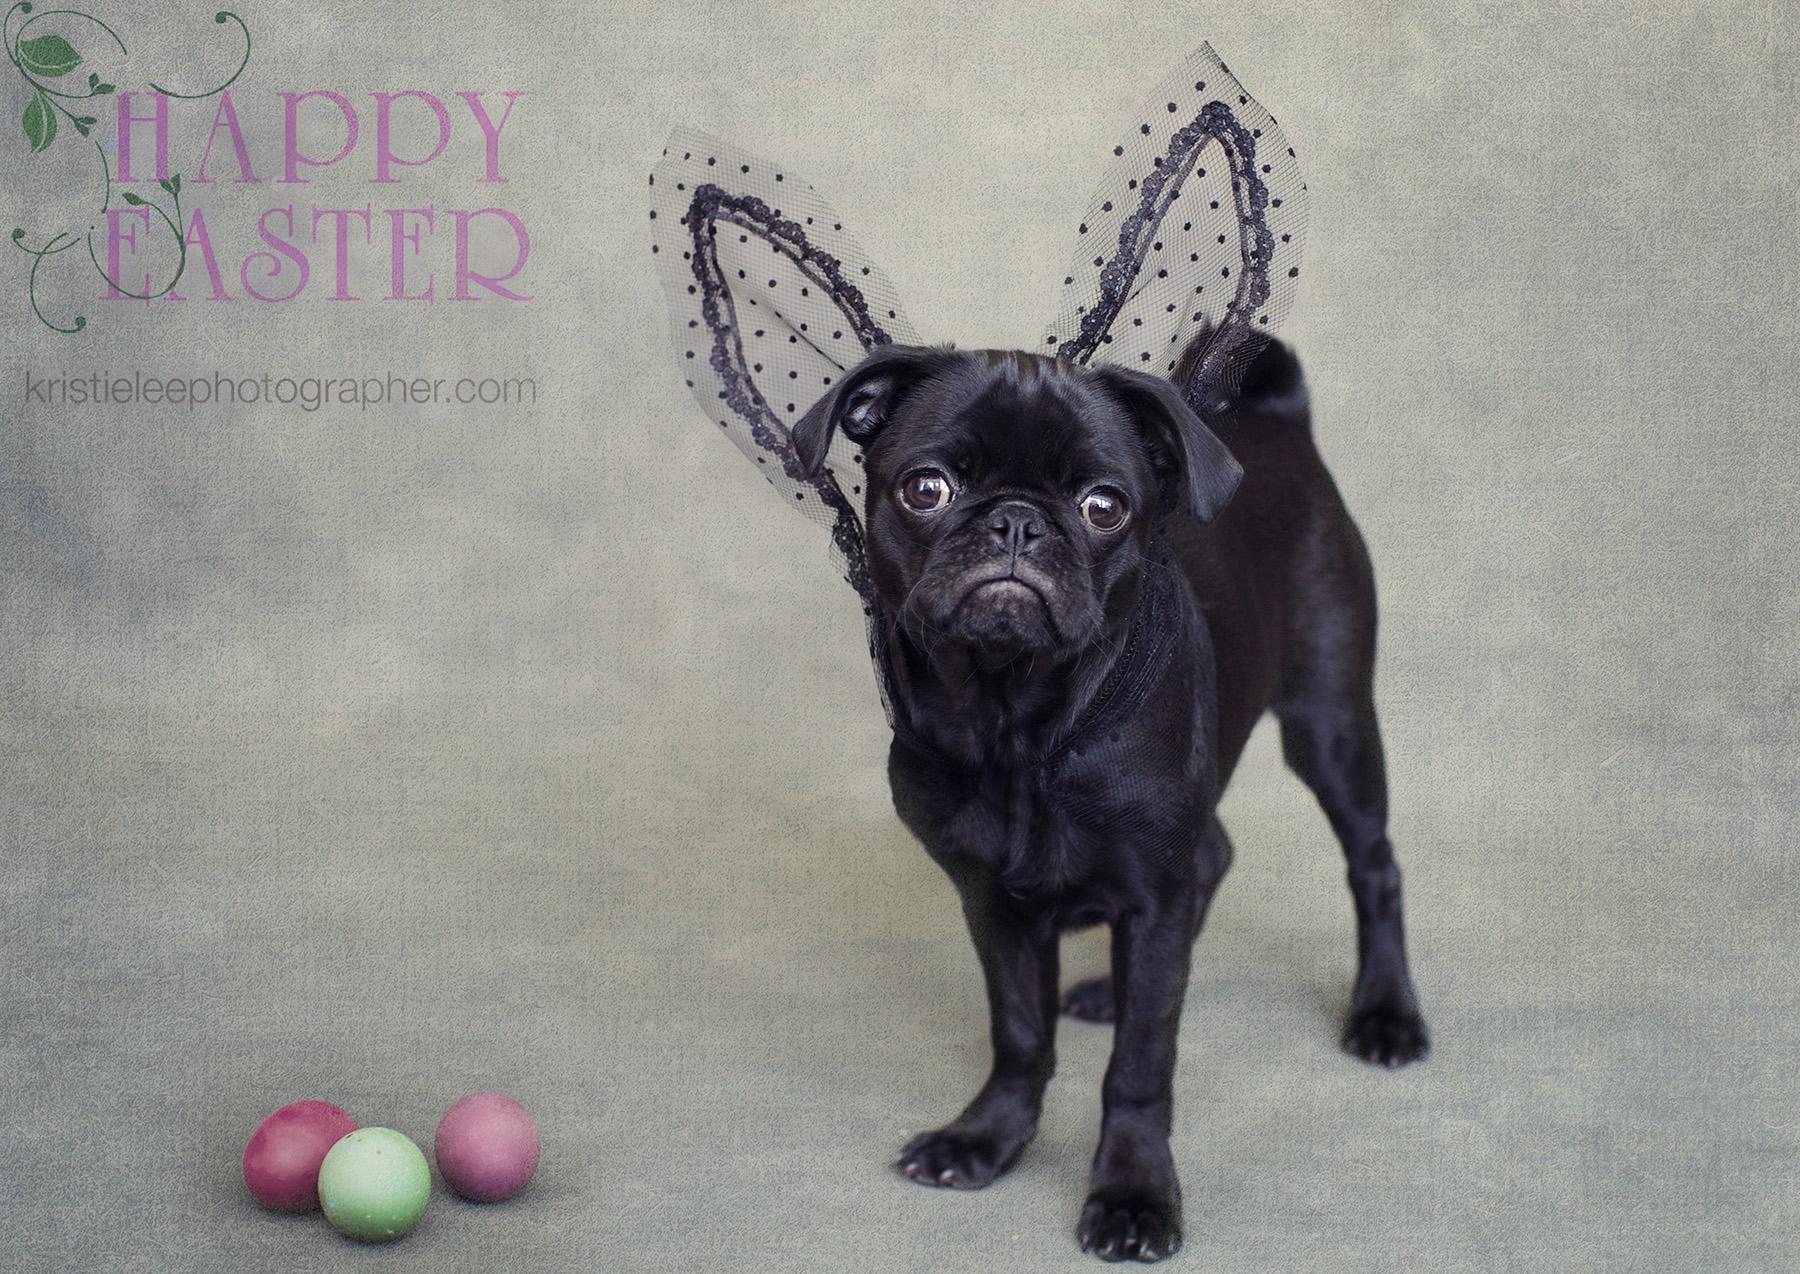 Happy Easter Kristieleephotographer low